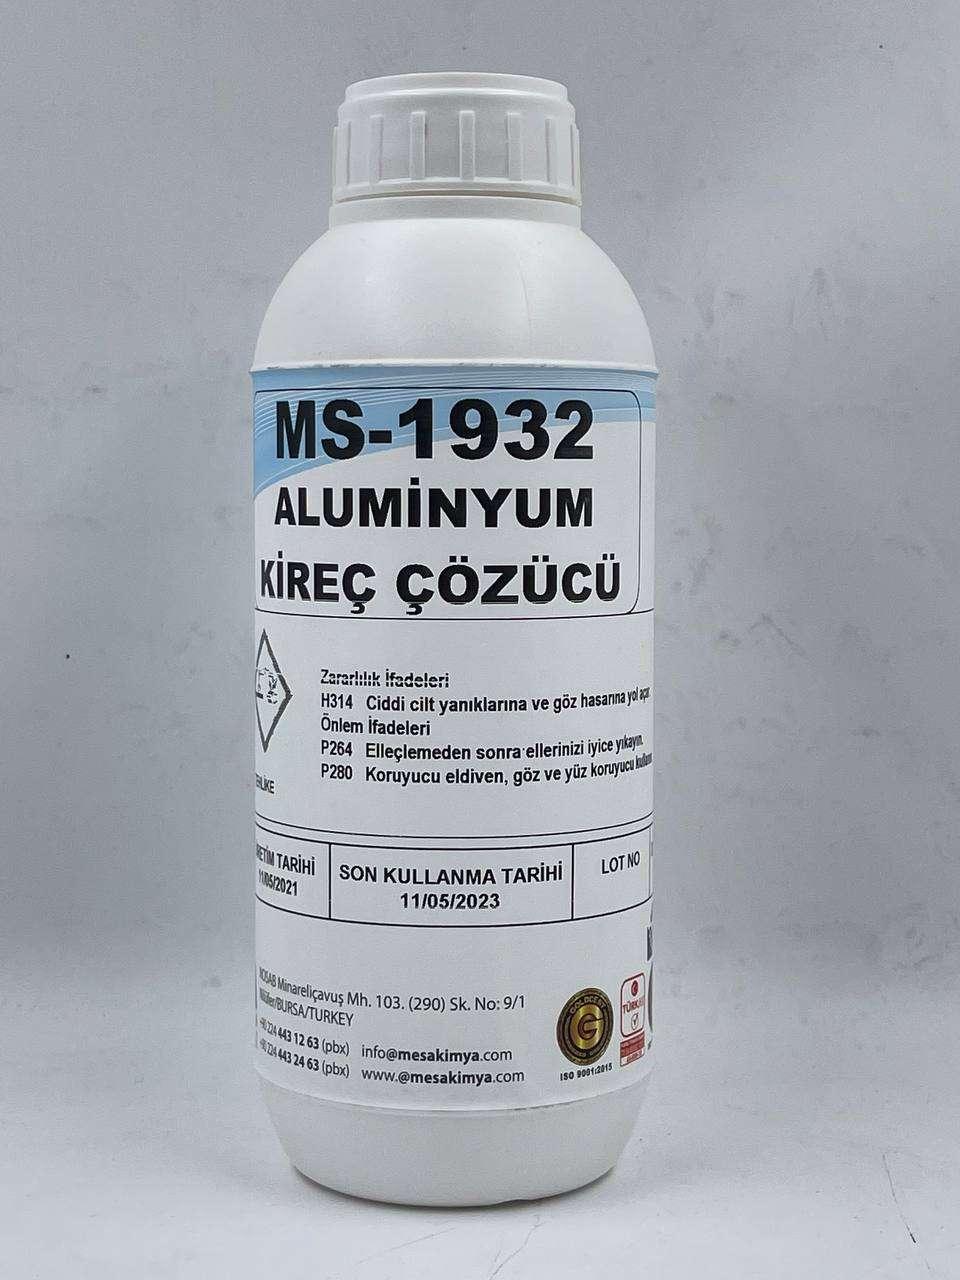 Alüminyum kireç çözücü